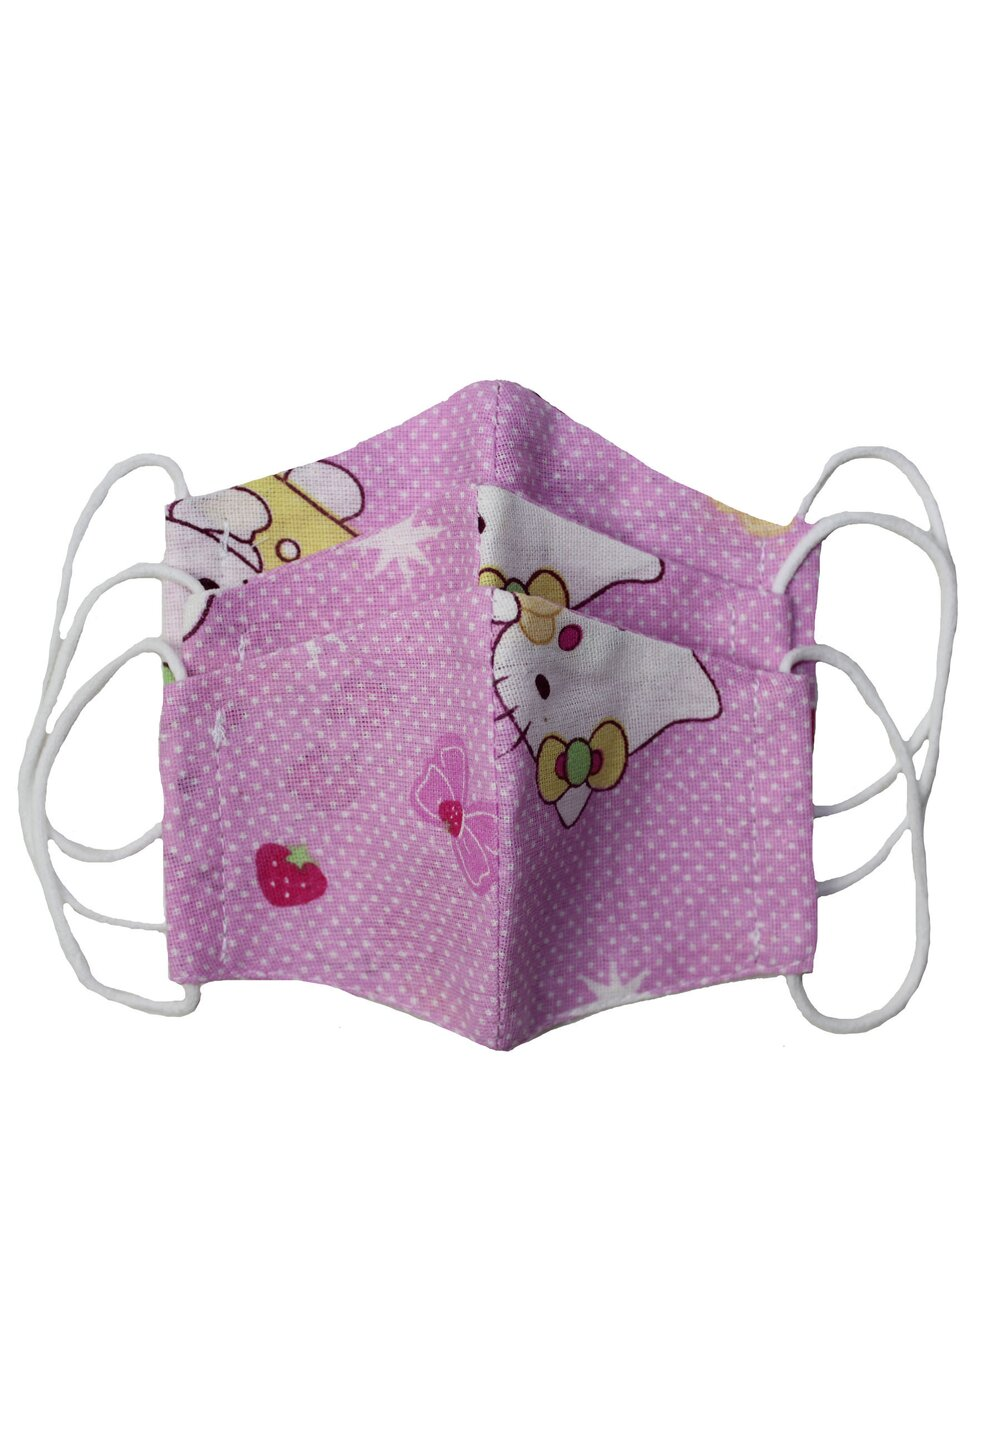 Masca reutilizabila, set 3 buc, fete, 2-6 ani, Hello Kitty imagine